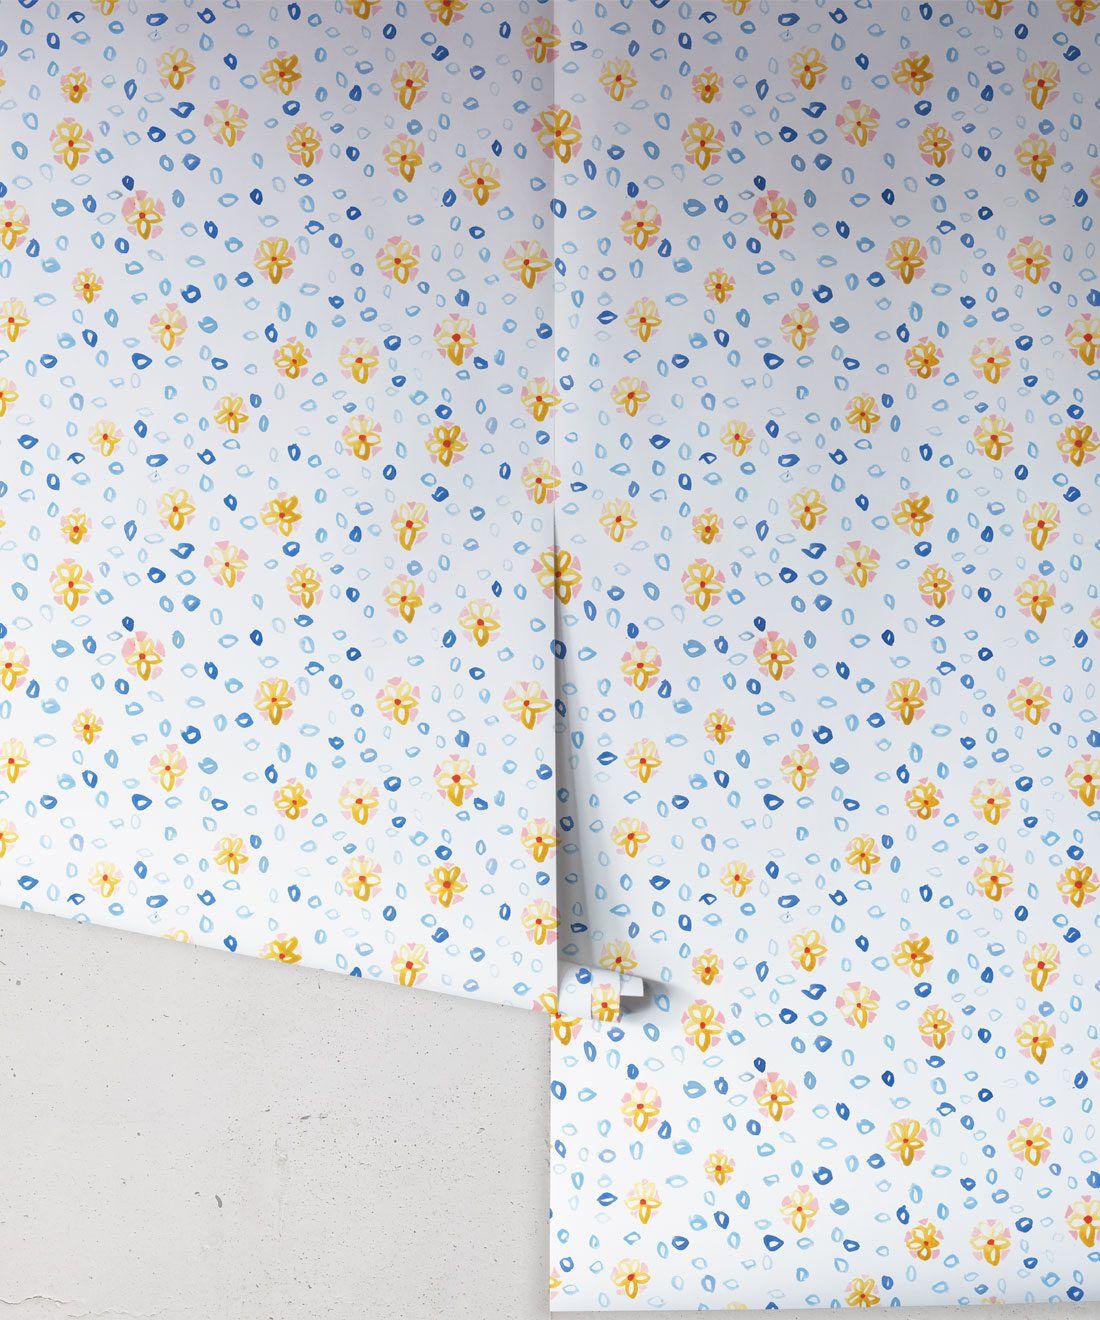 Al Hadiqa Wallpaper • Dainty Floral Design • Inky Flowery Pattern • Milton & King Australia • Wallpaper Rolls • Free Shipping